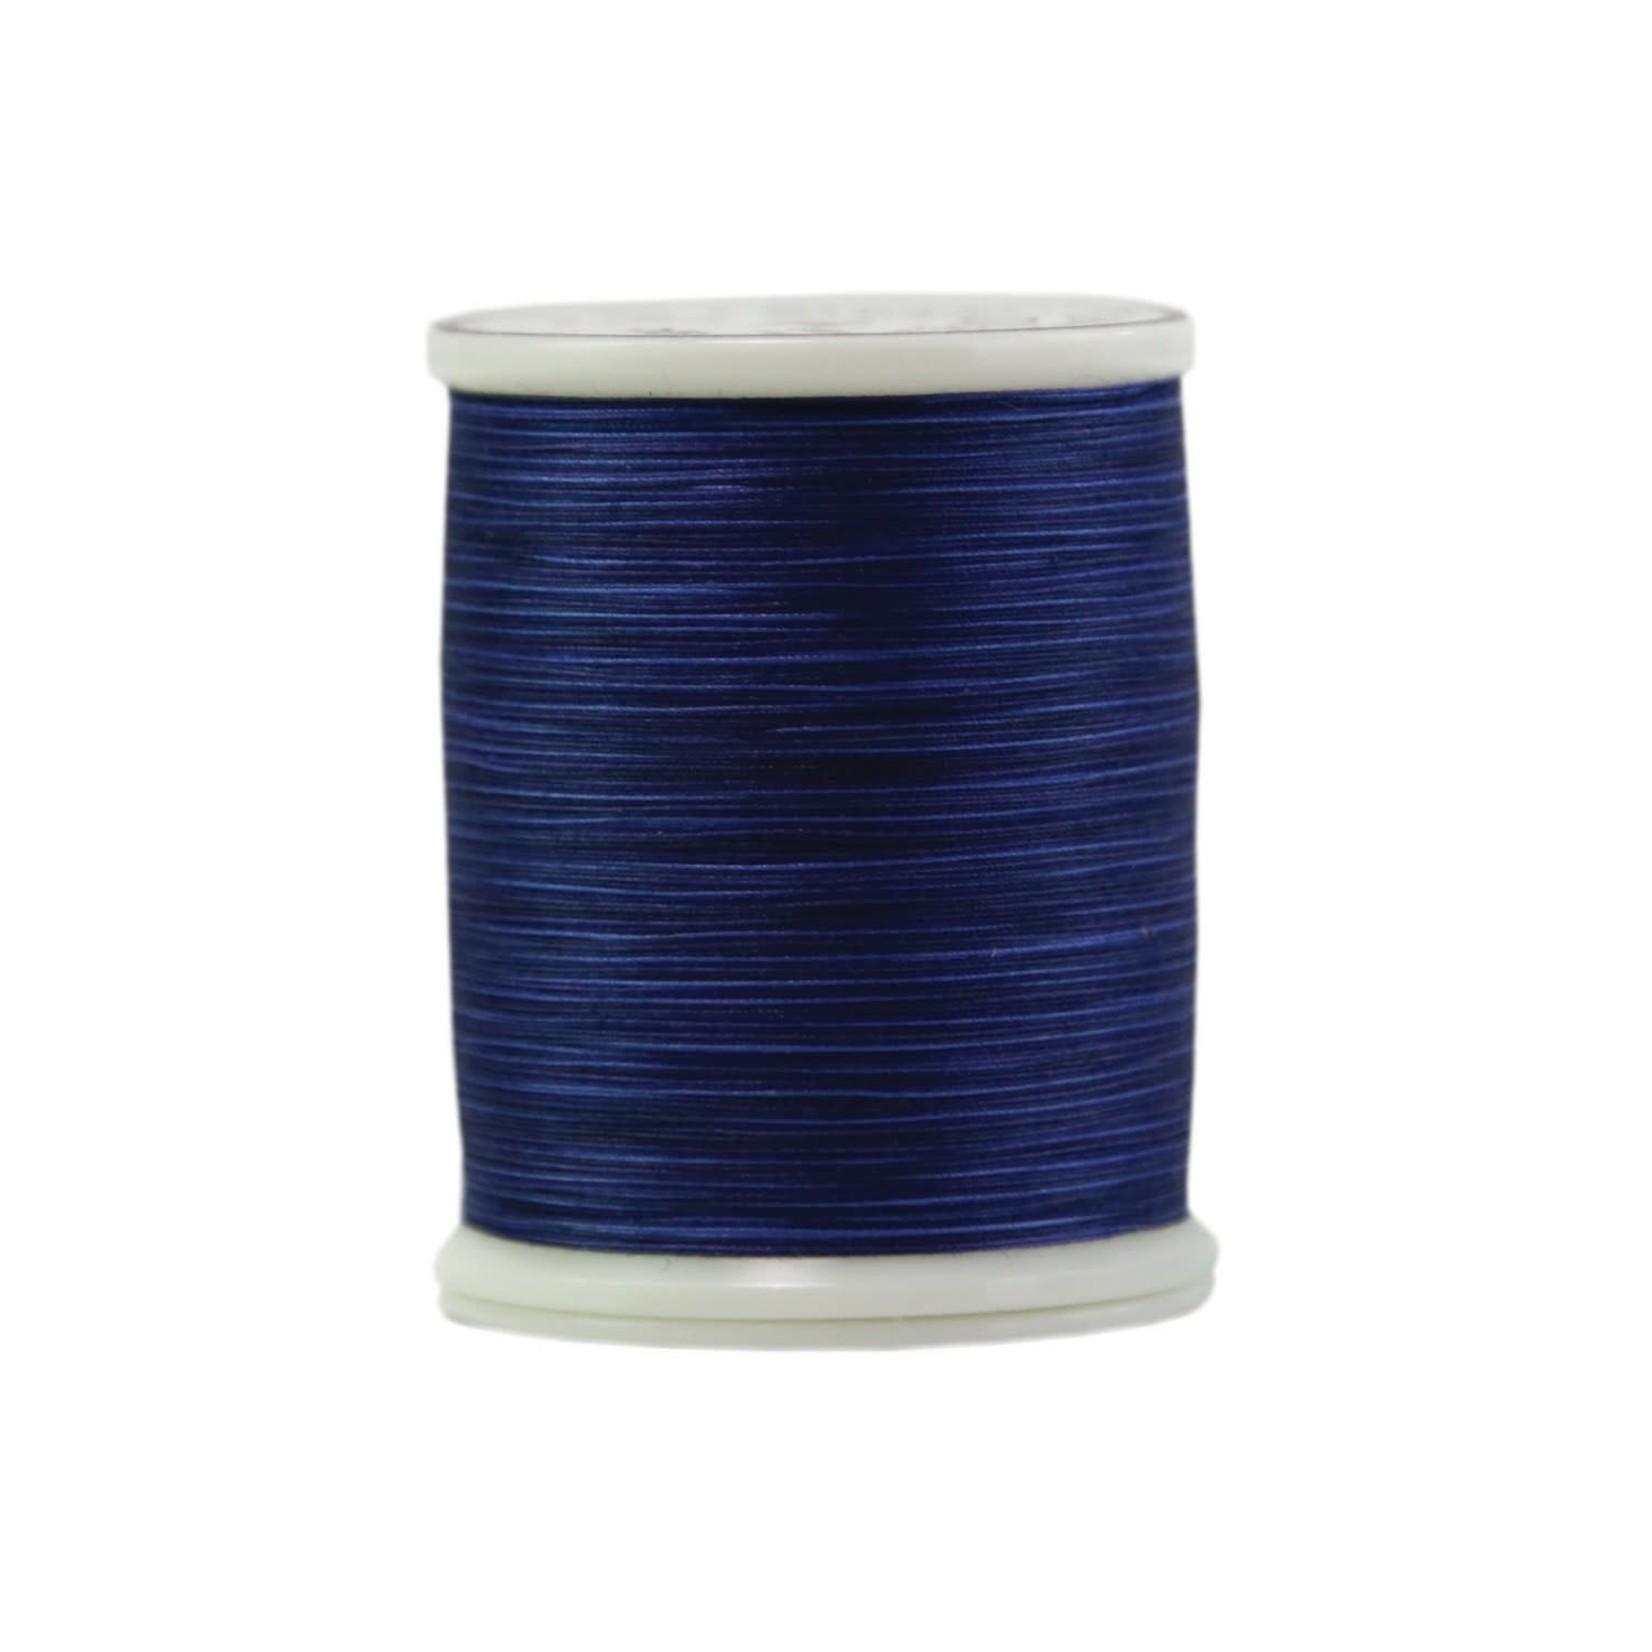 Superior Threads King Tut - #40 - 457 m - 1055 Mariana